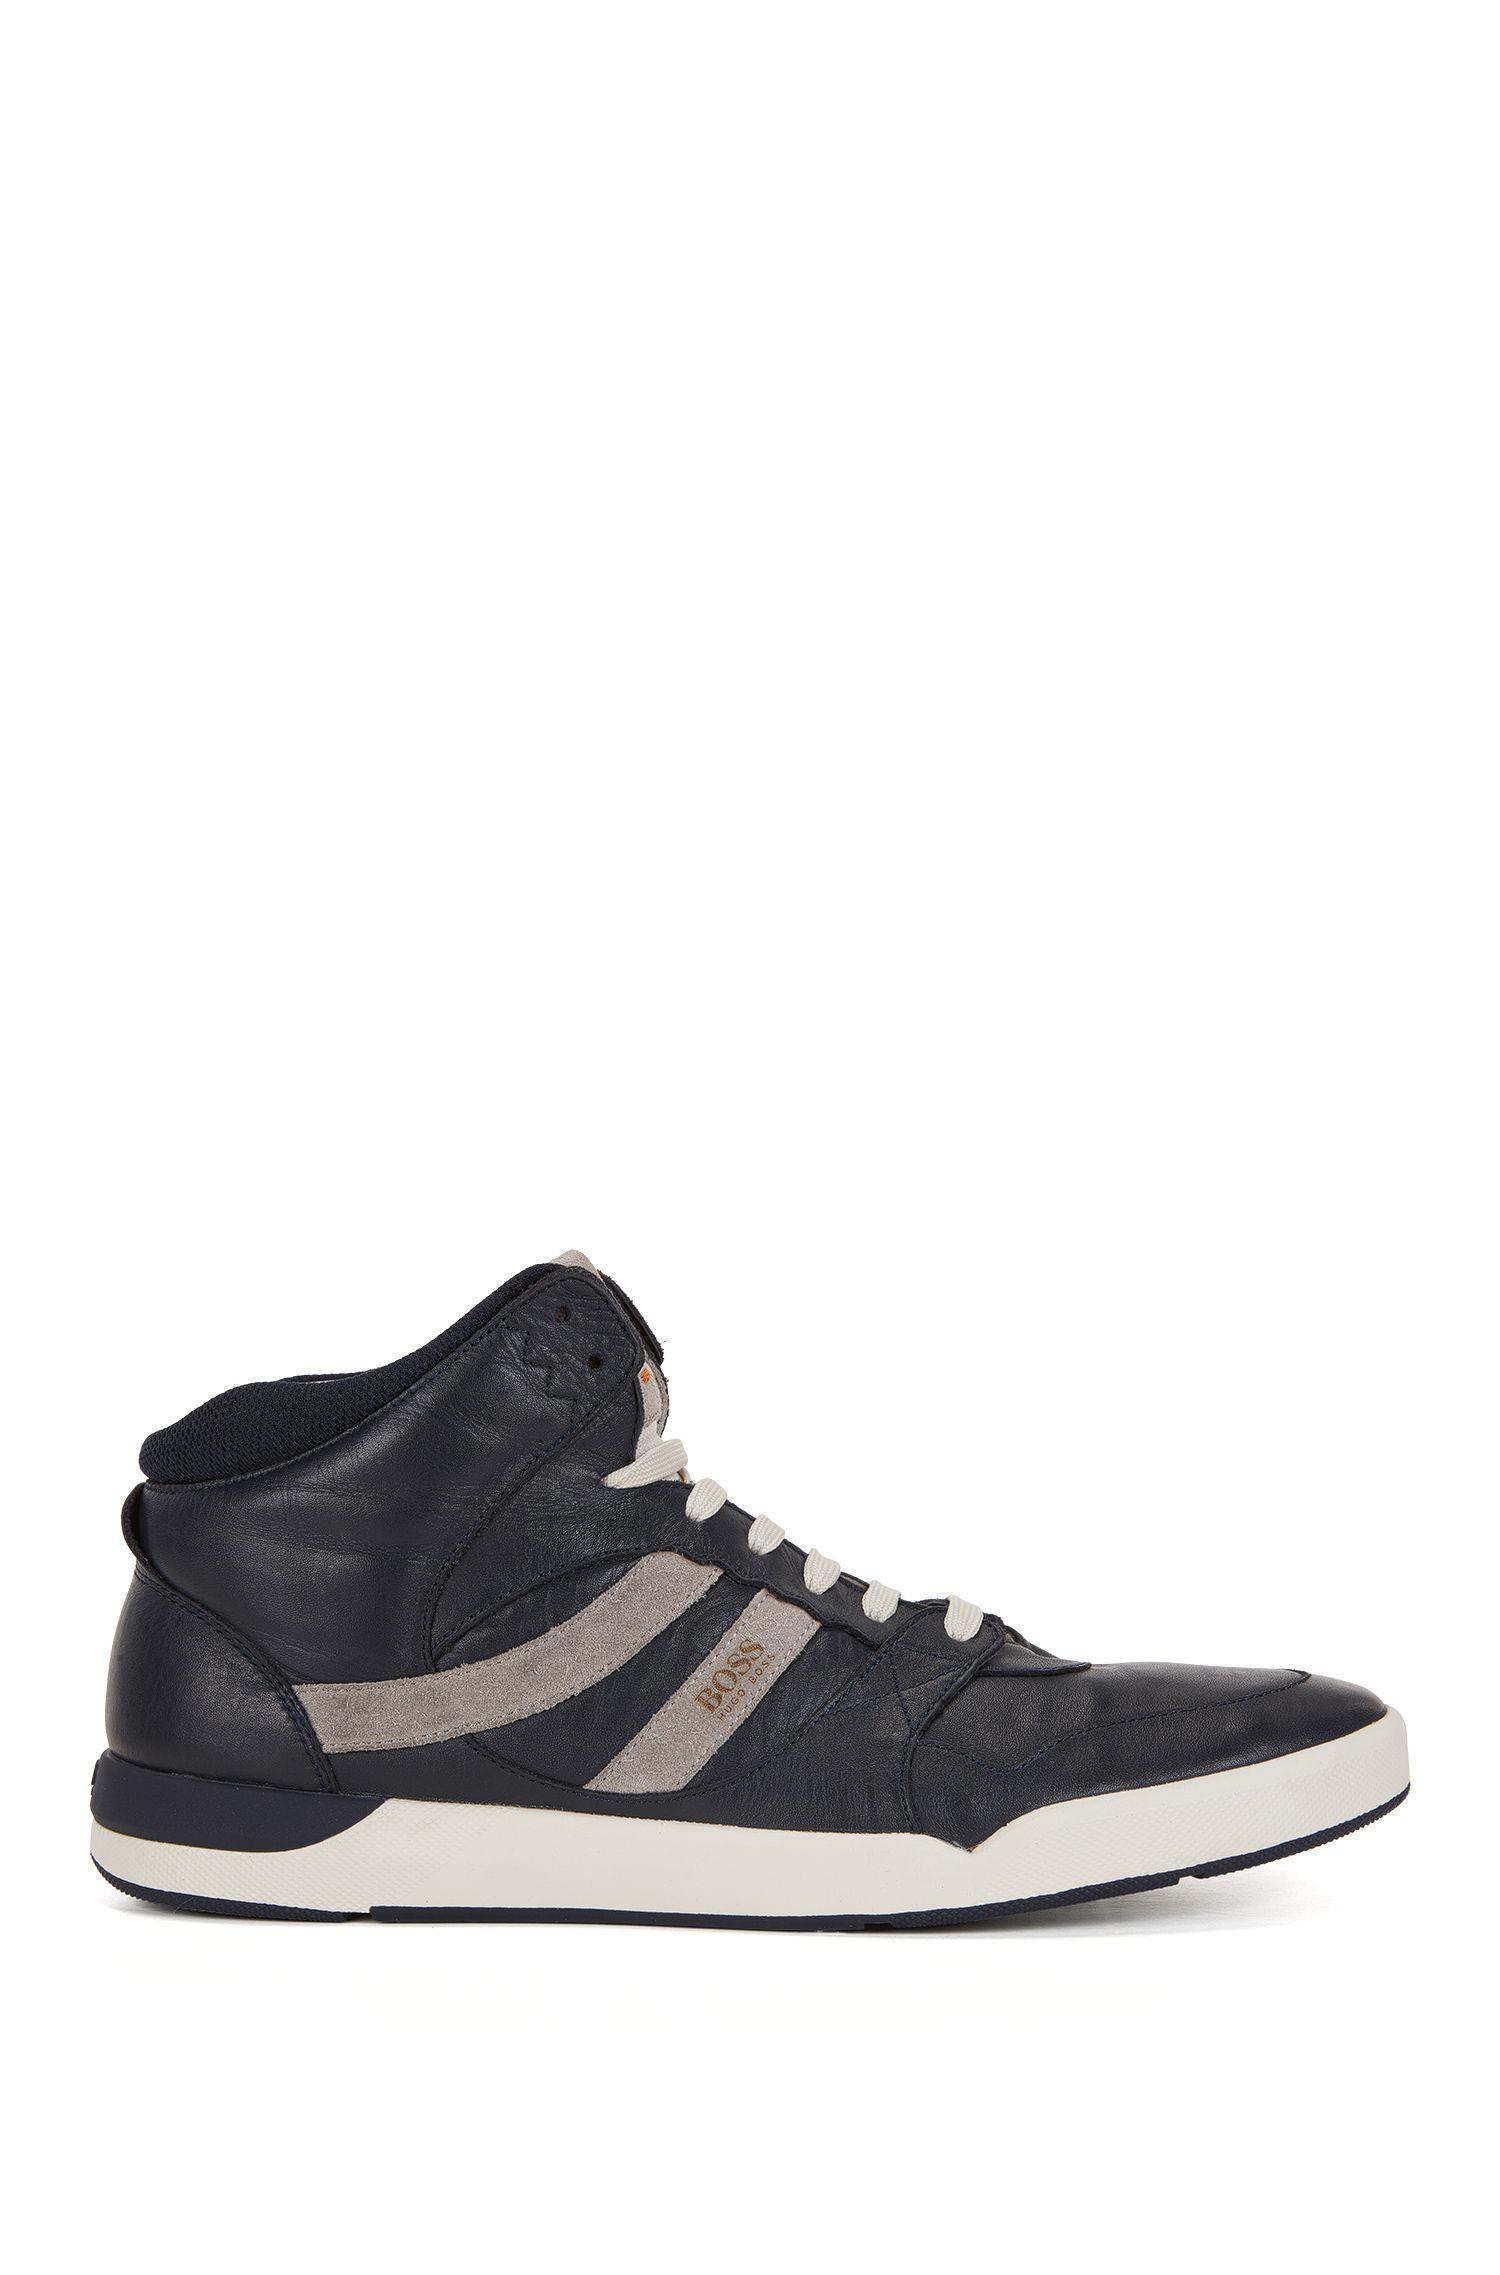 Sneakers high-top in pelle lavata